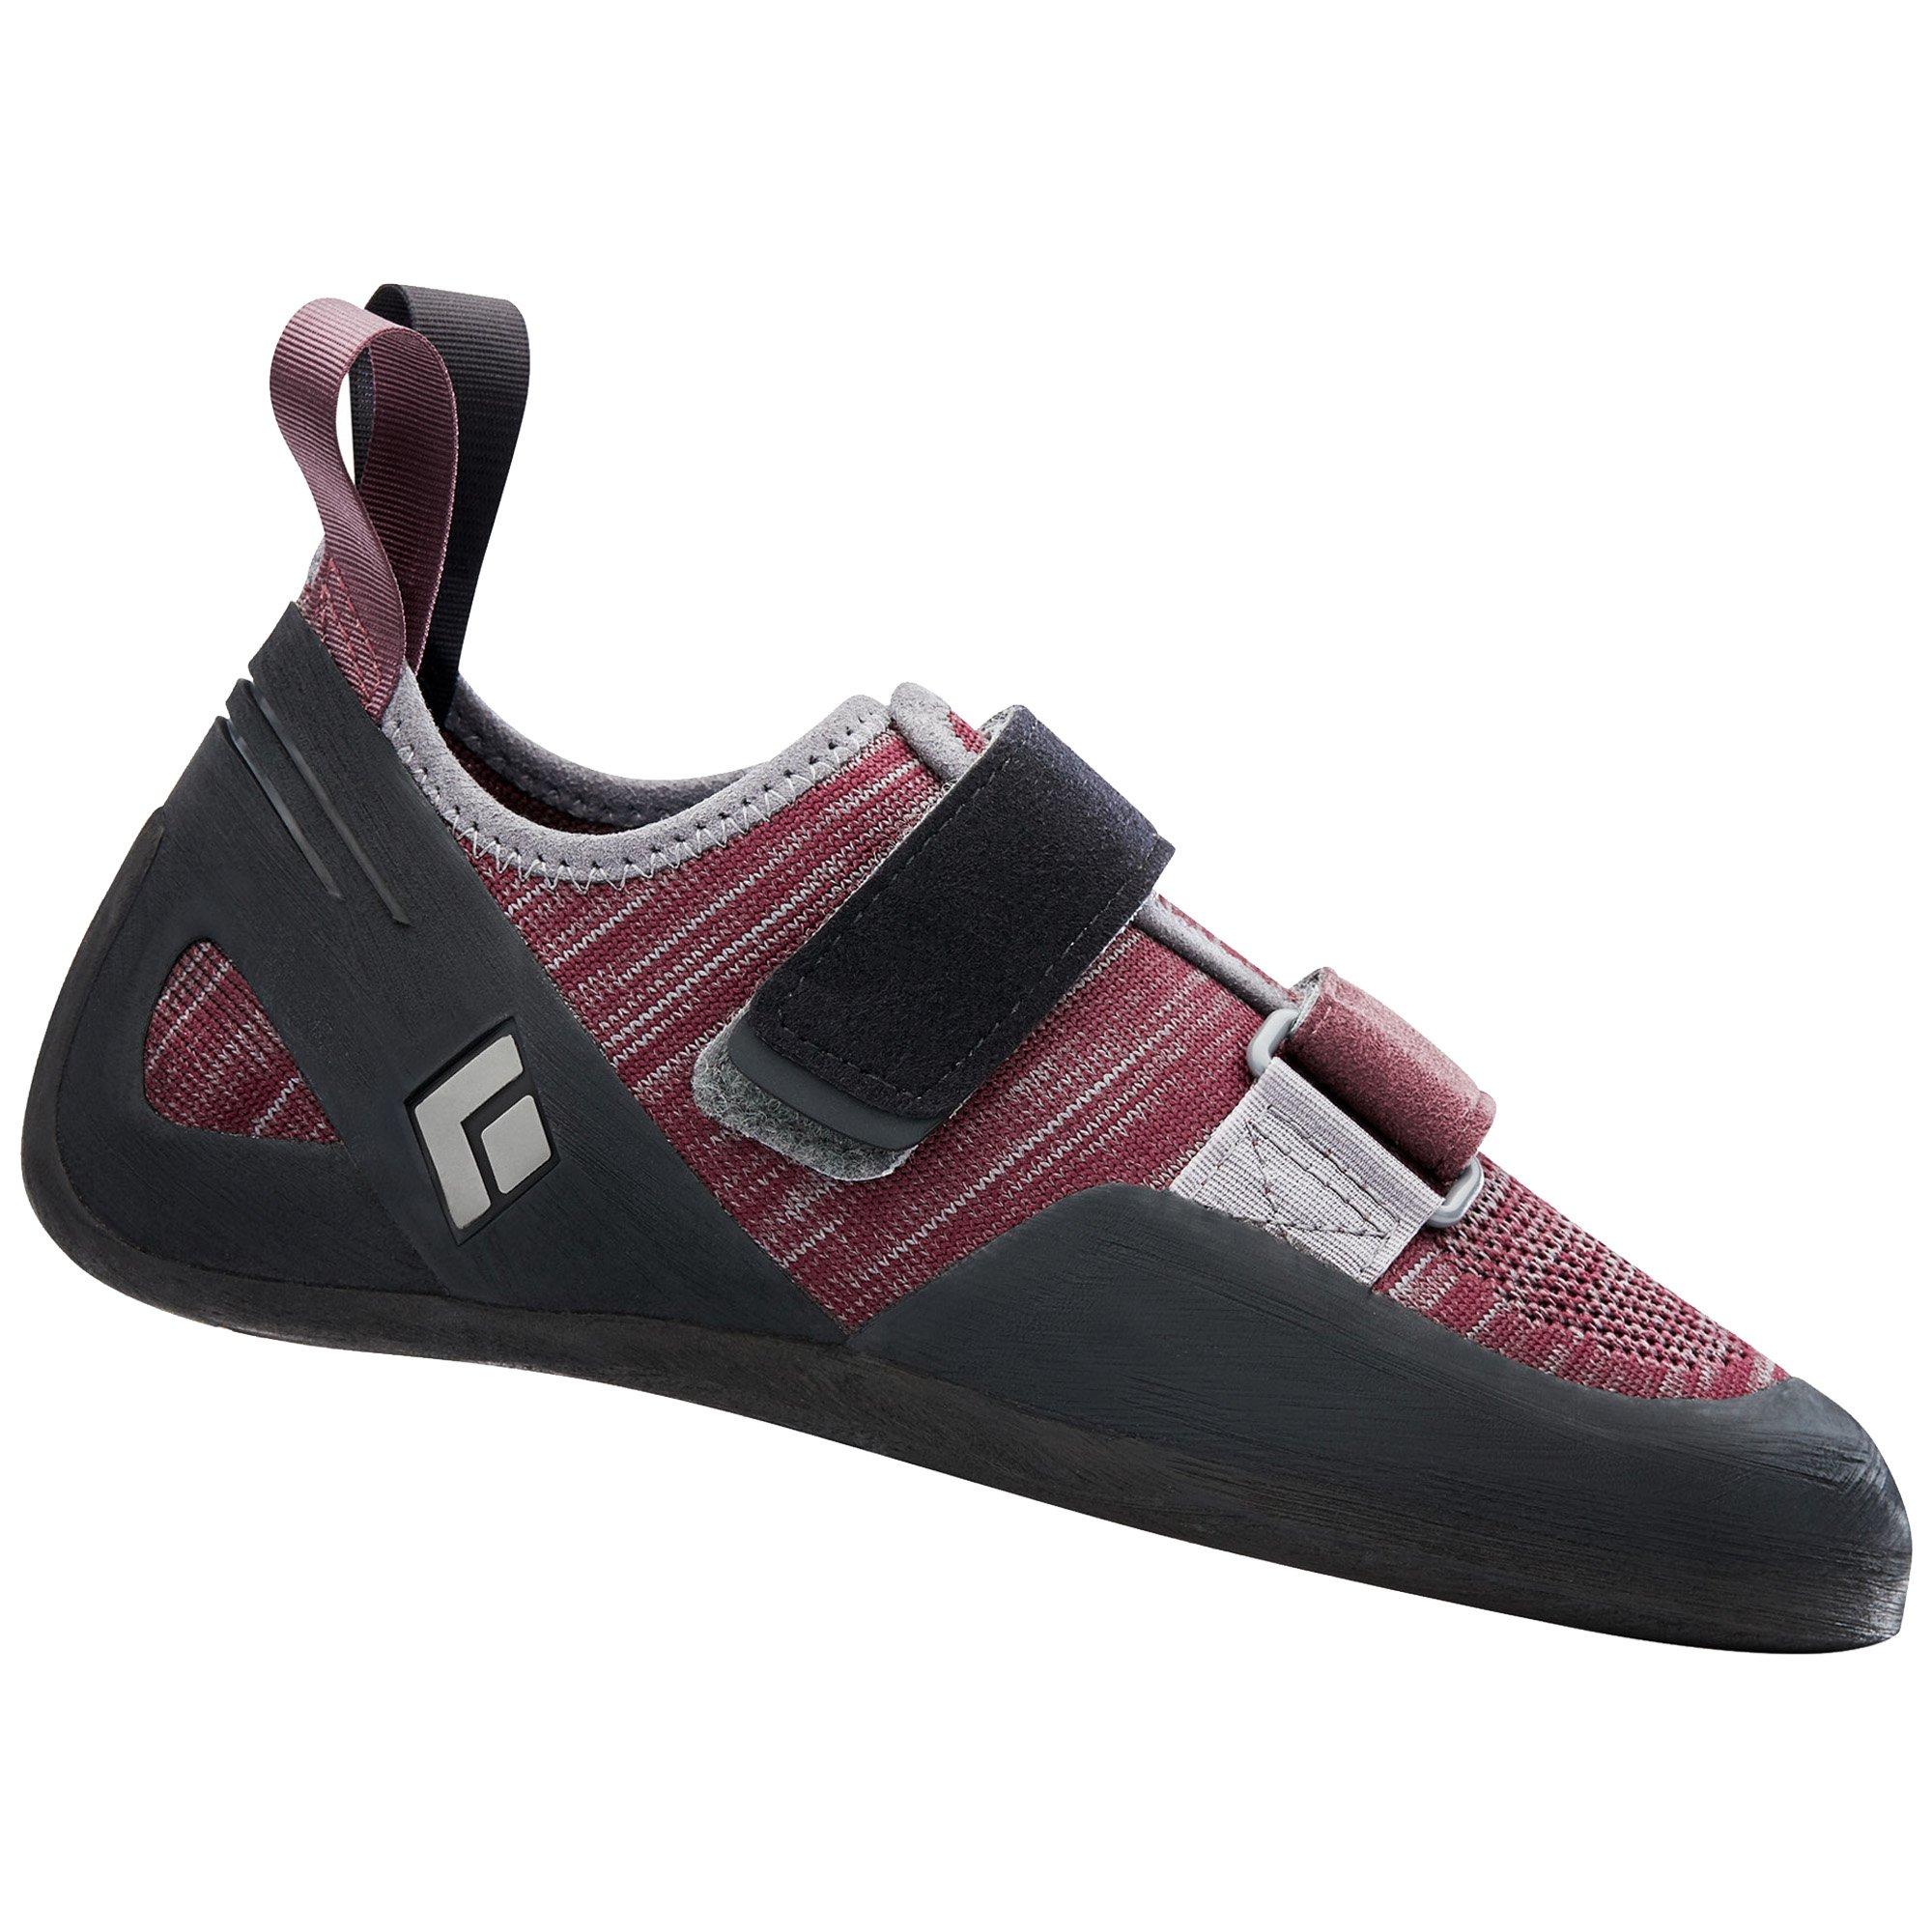 Black Diamond Momentum Climbing Shoe - Women's Merlot, 10.5